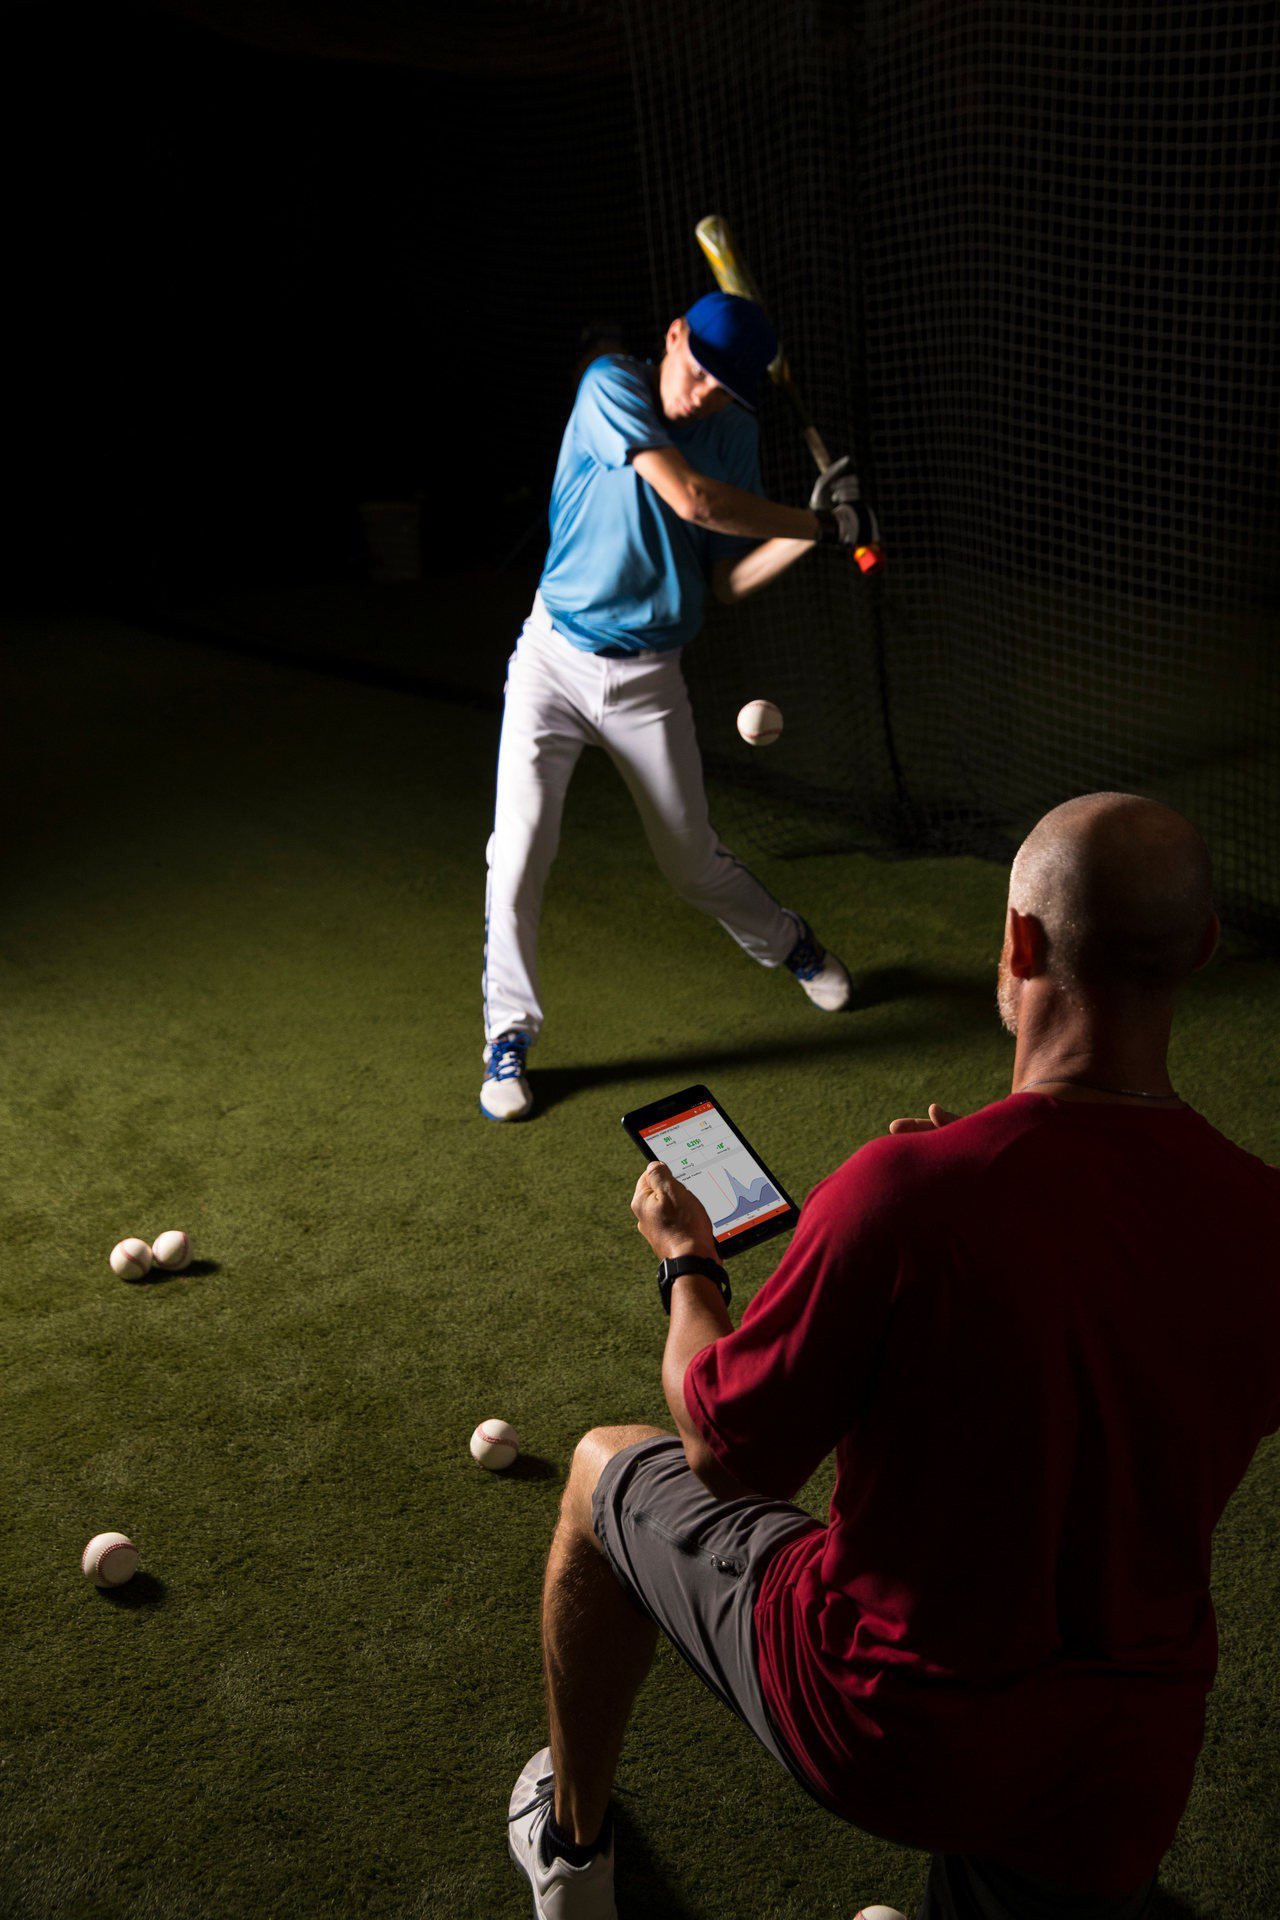 Garmin推出棒壘球產品「Impact揮棒訓練分析儀」,可協助選手與玩家改善打...